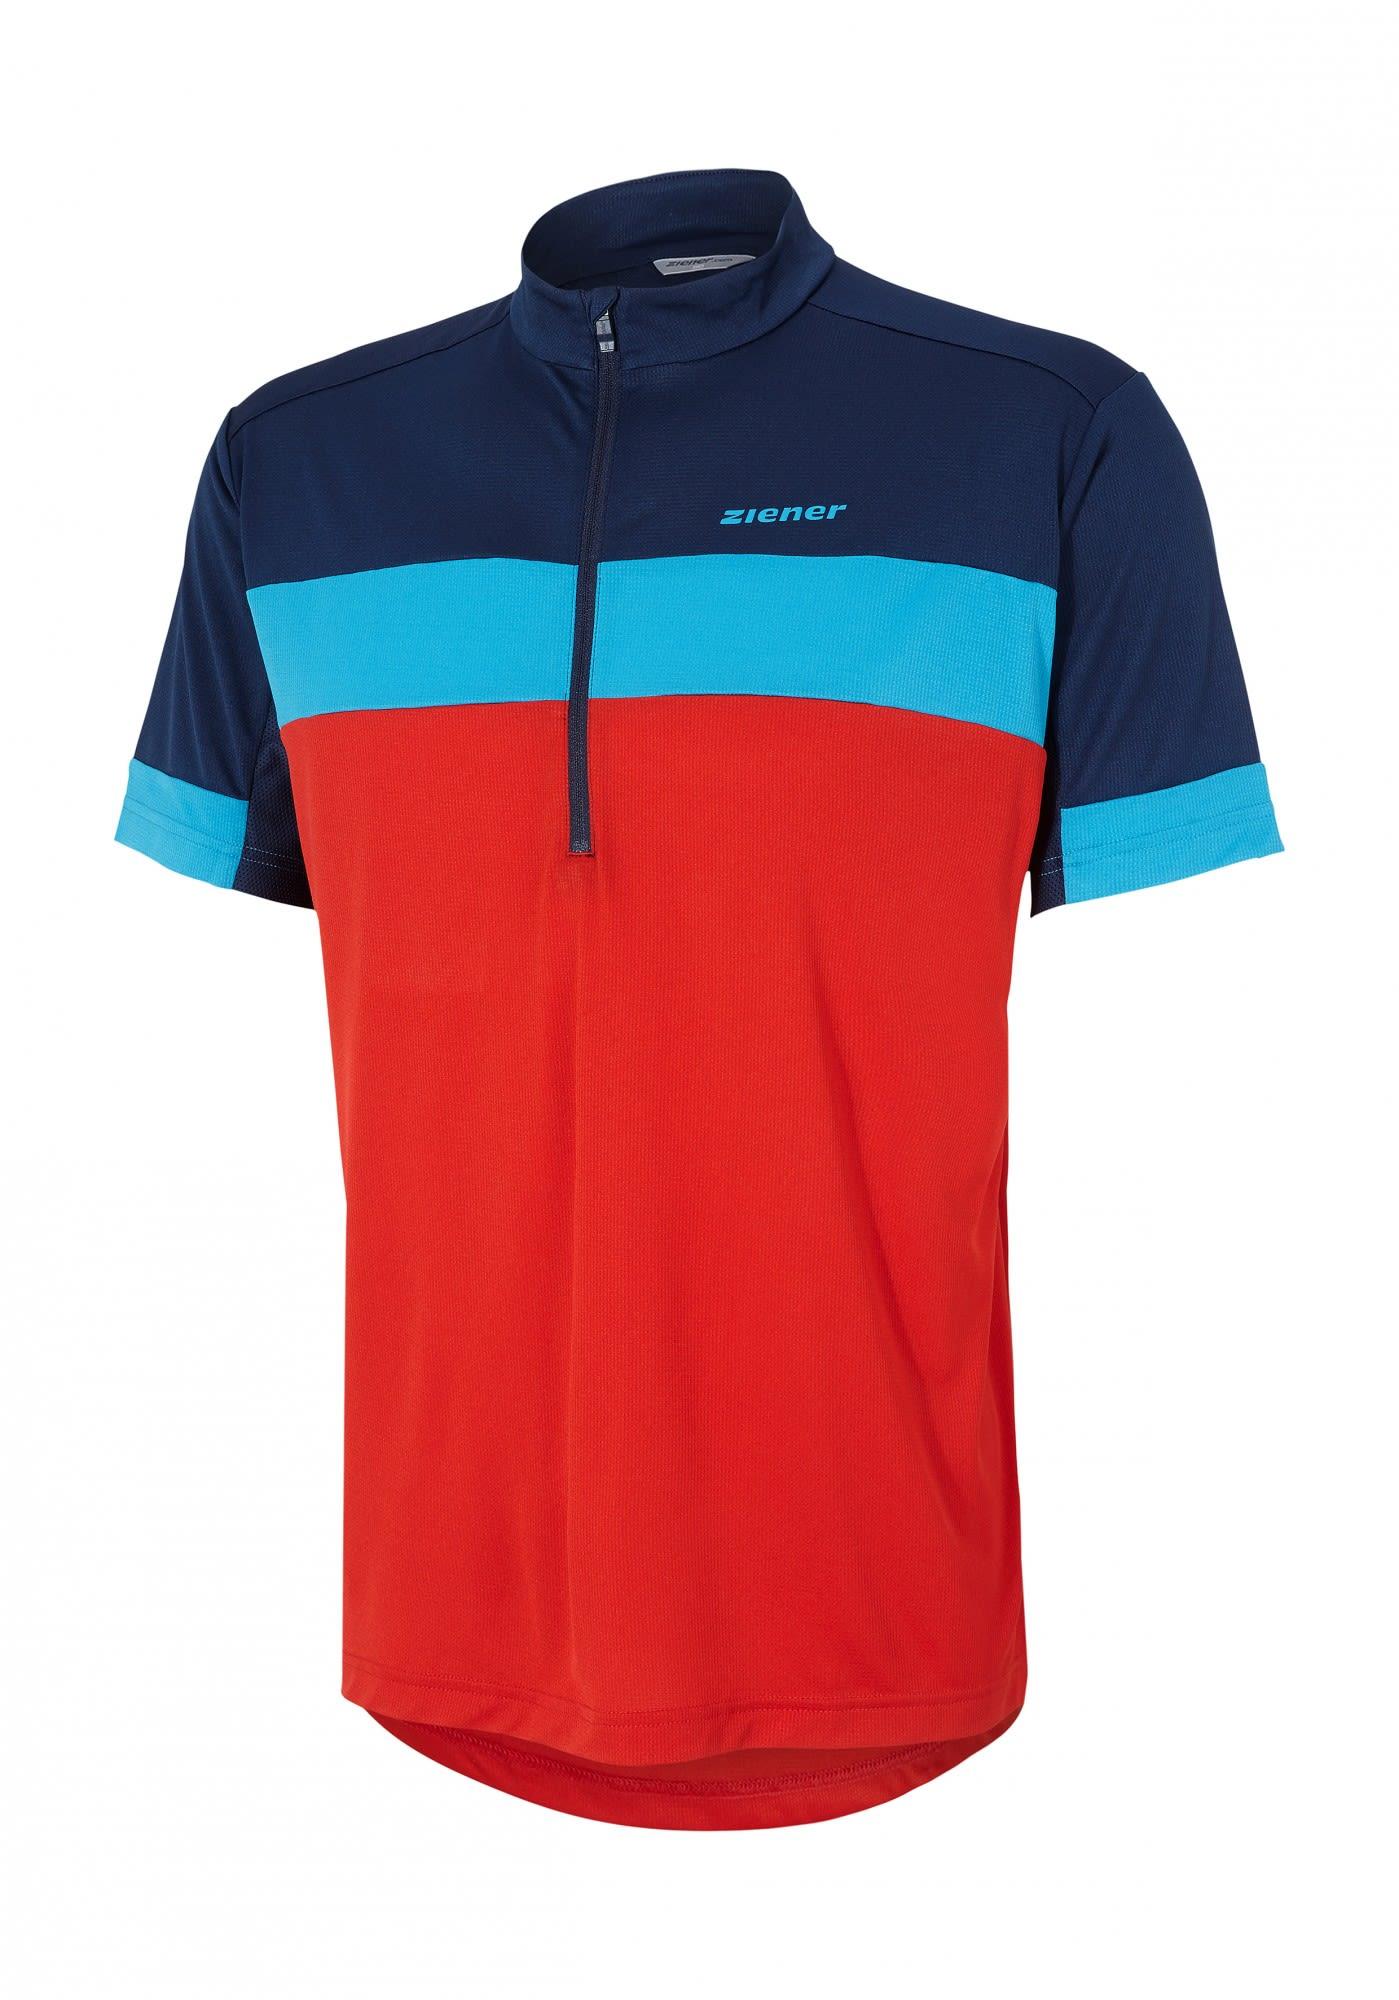 Ziener Cogel Rot, Male Kurzarm-Shirt, 50